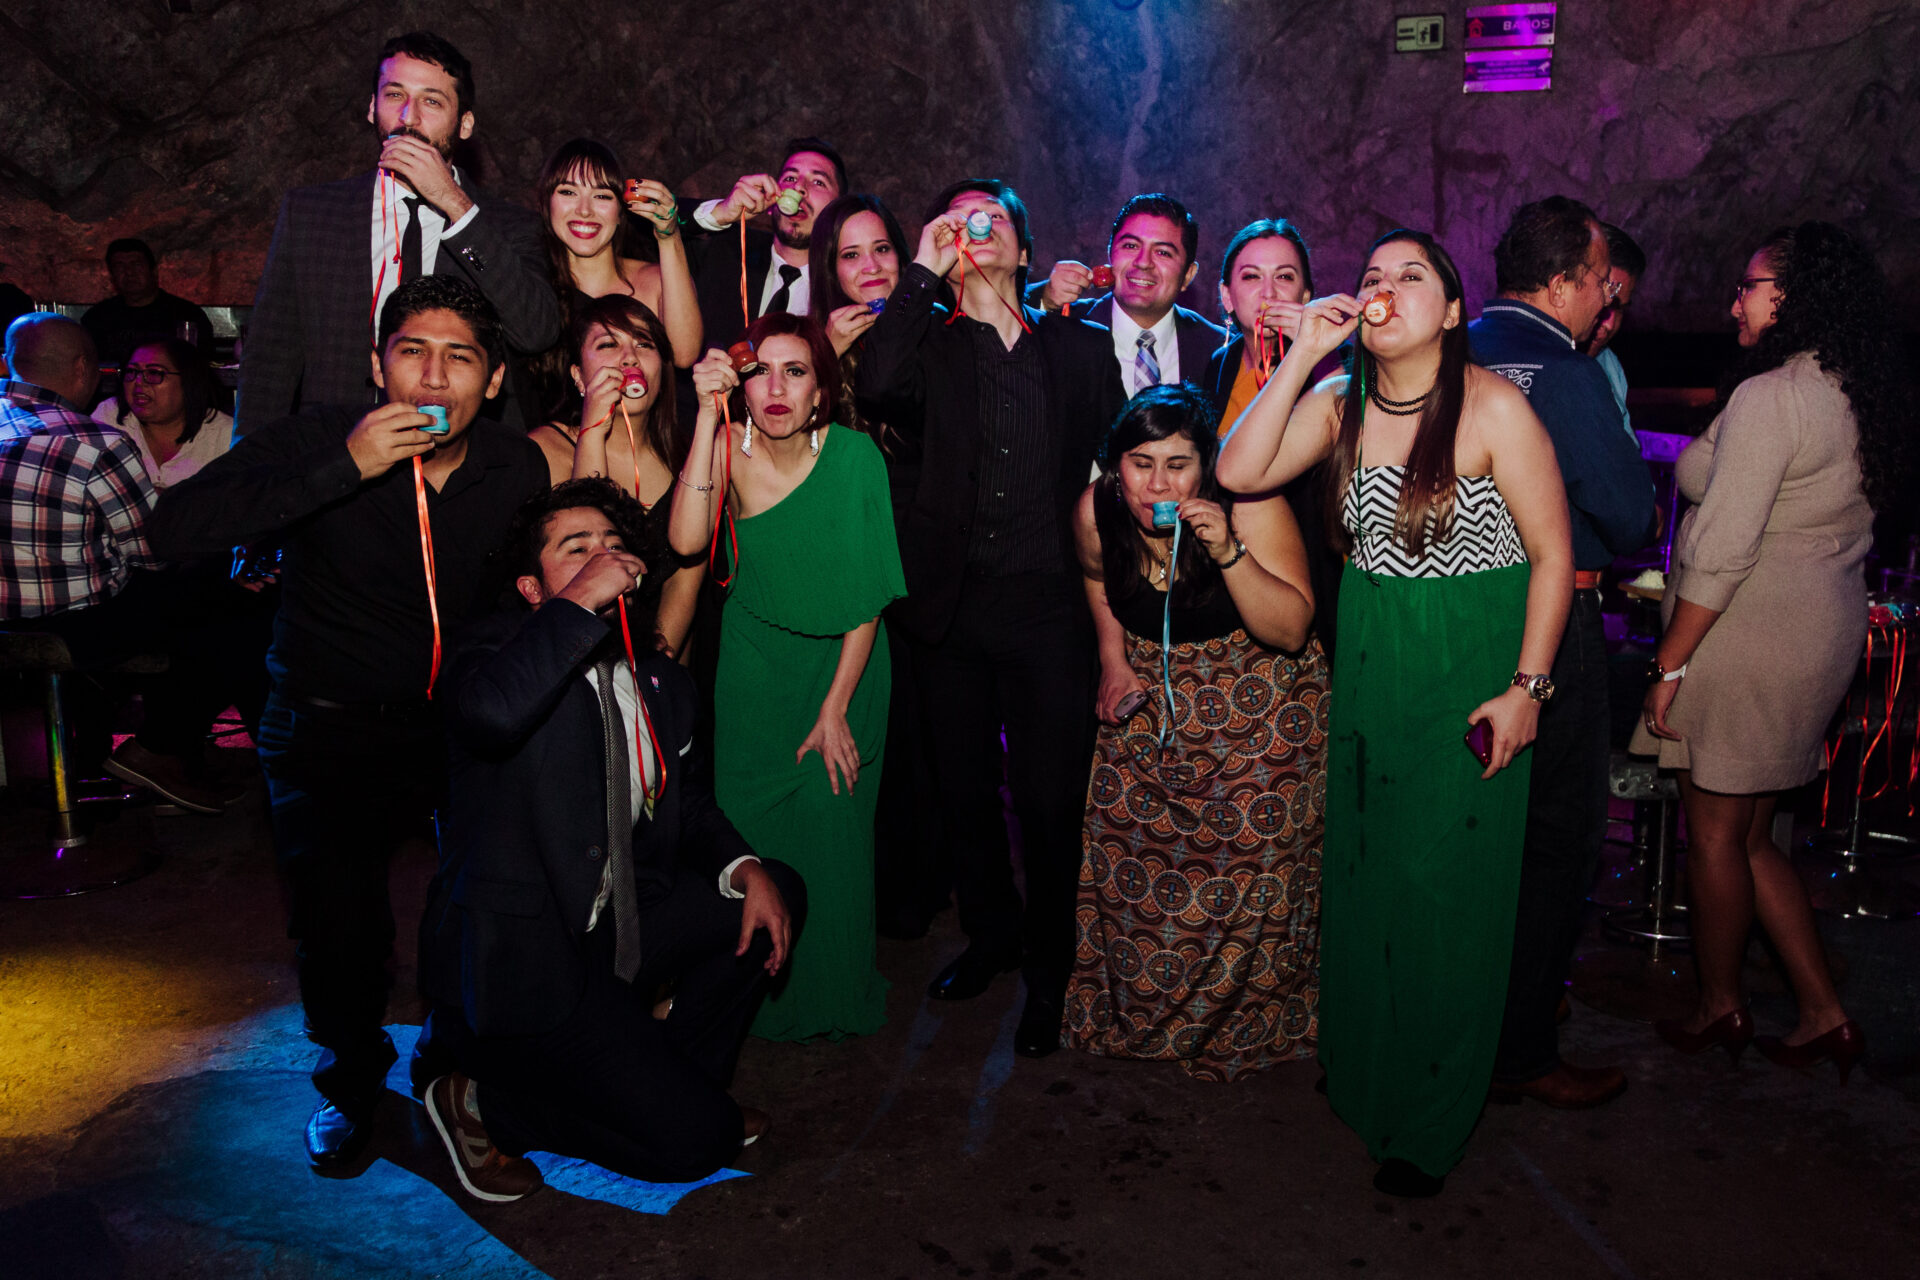 javier_noriega_fotografo_bodas_la_mina_club_zacatecas_wedding_photographer25